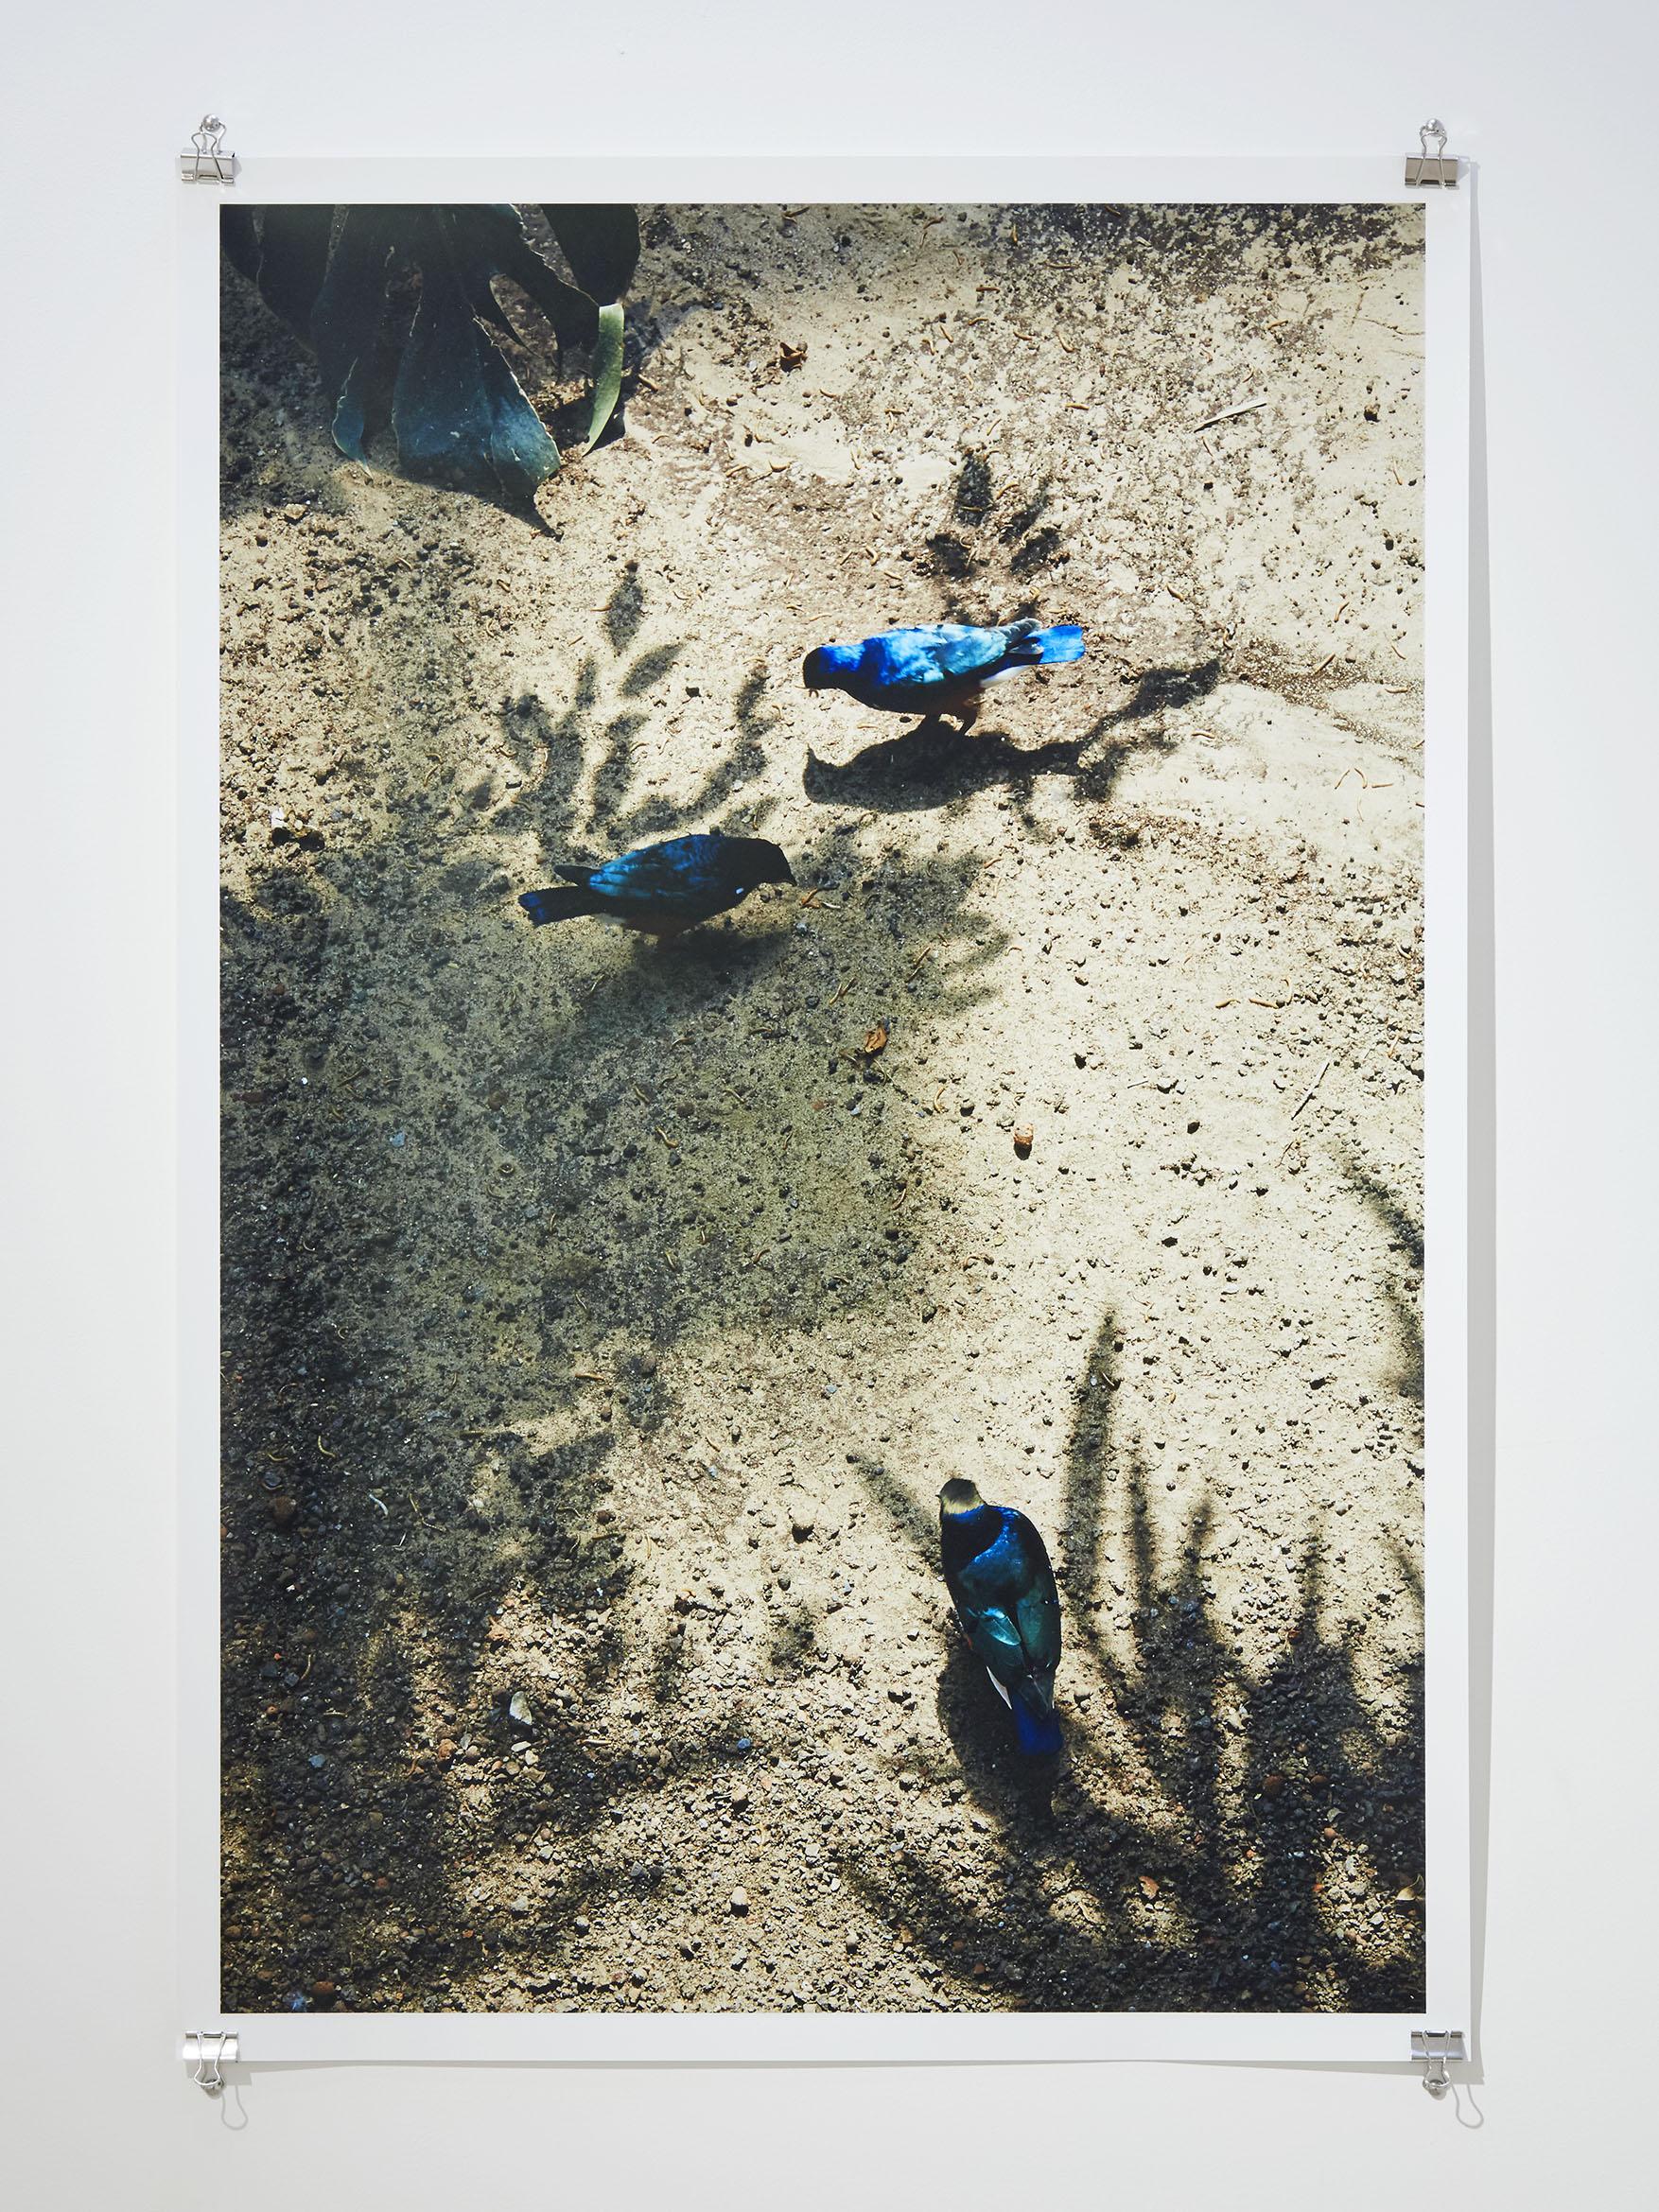 Birdhaus , 2015  Digital C-Type Print  70 x 48 cm